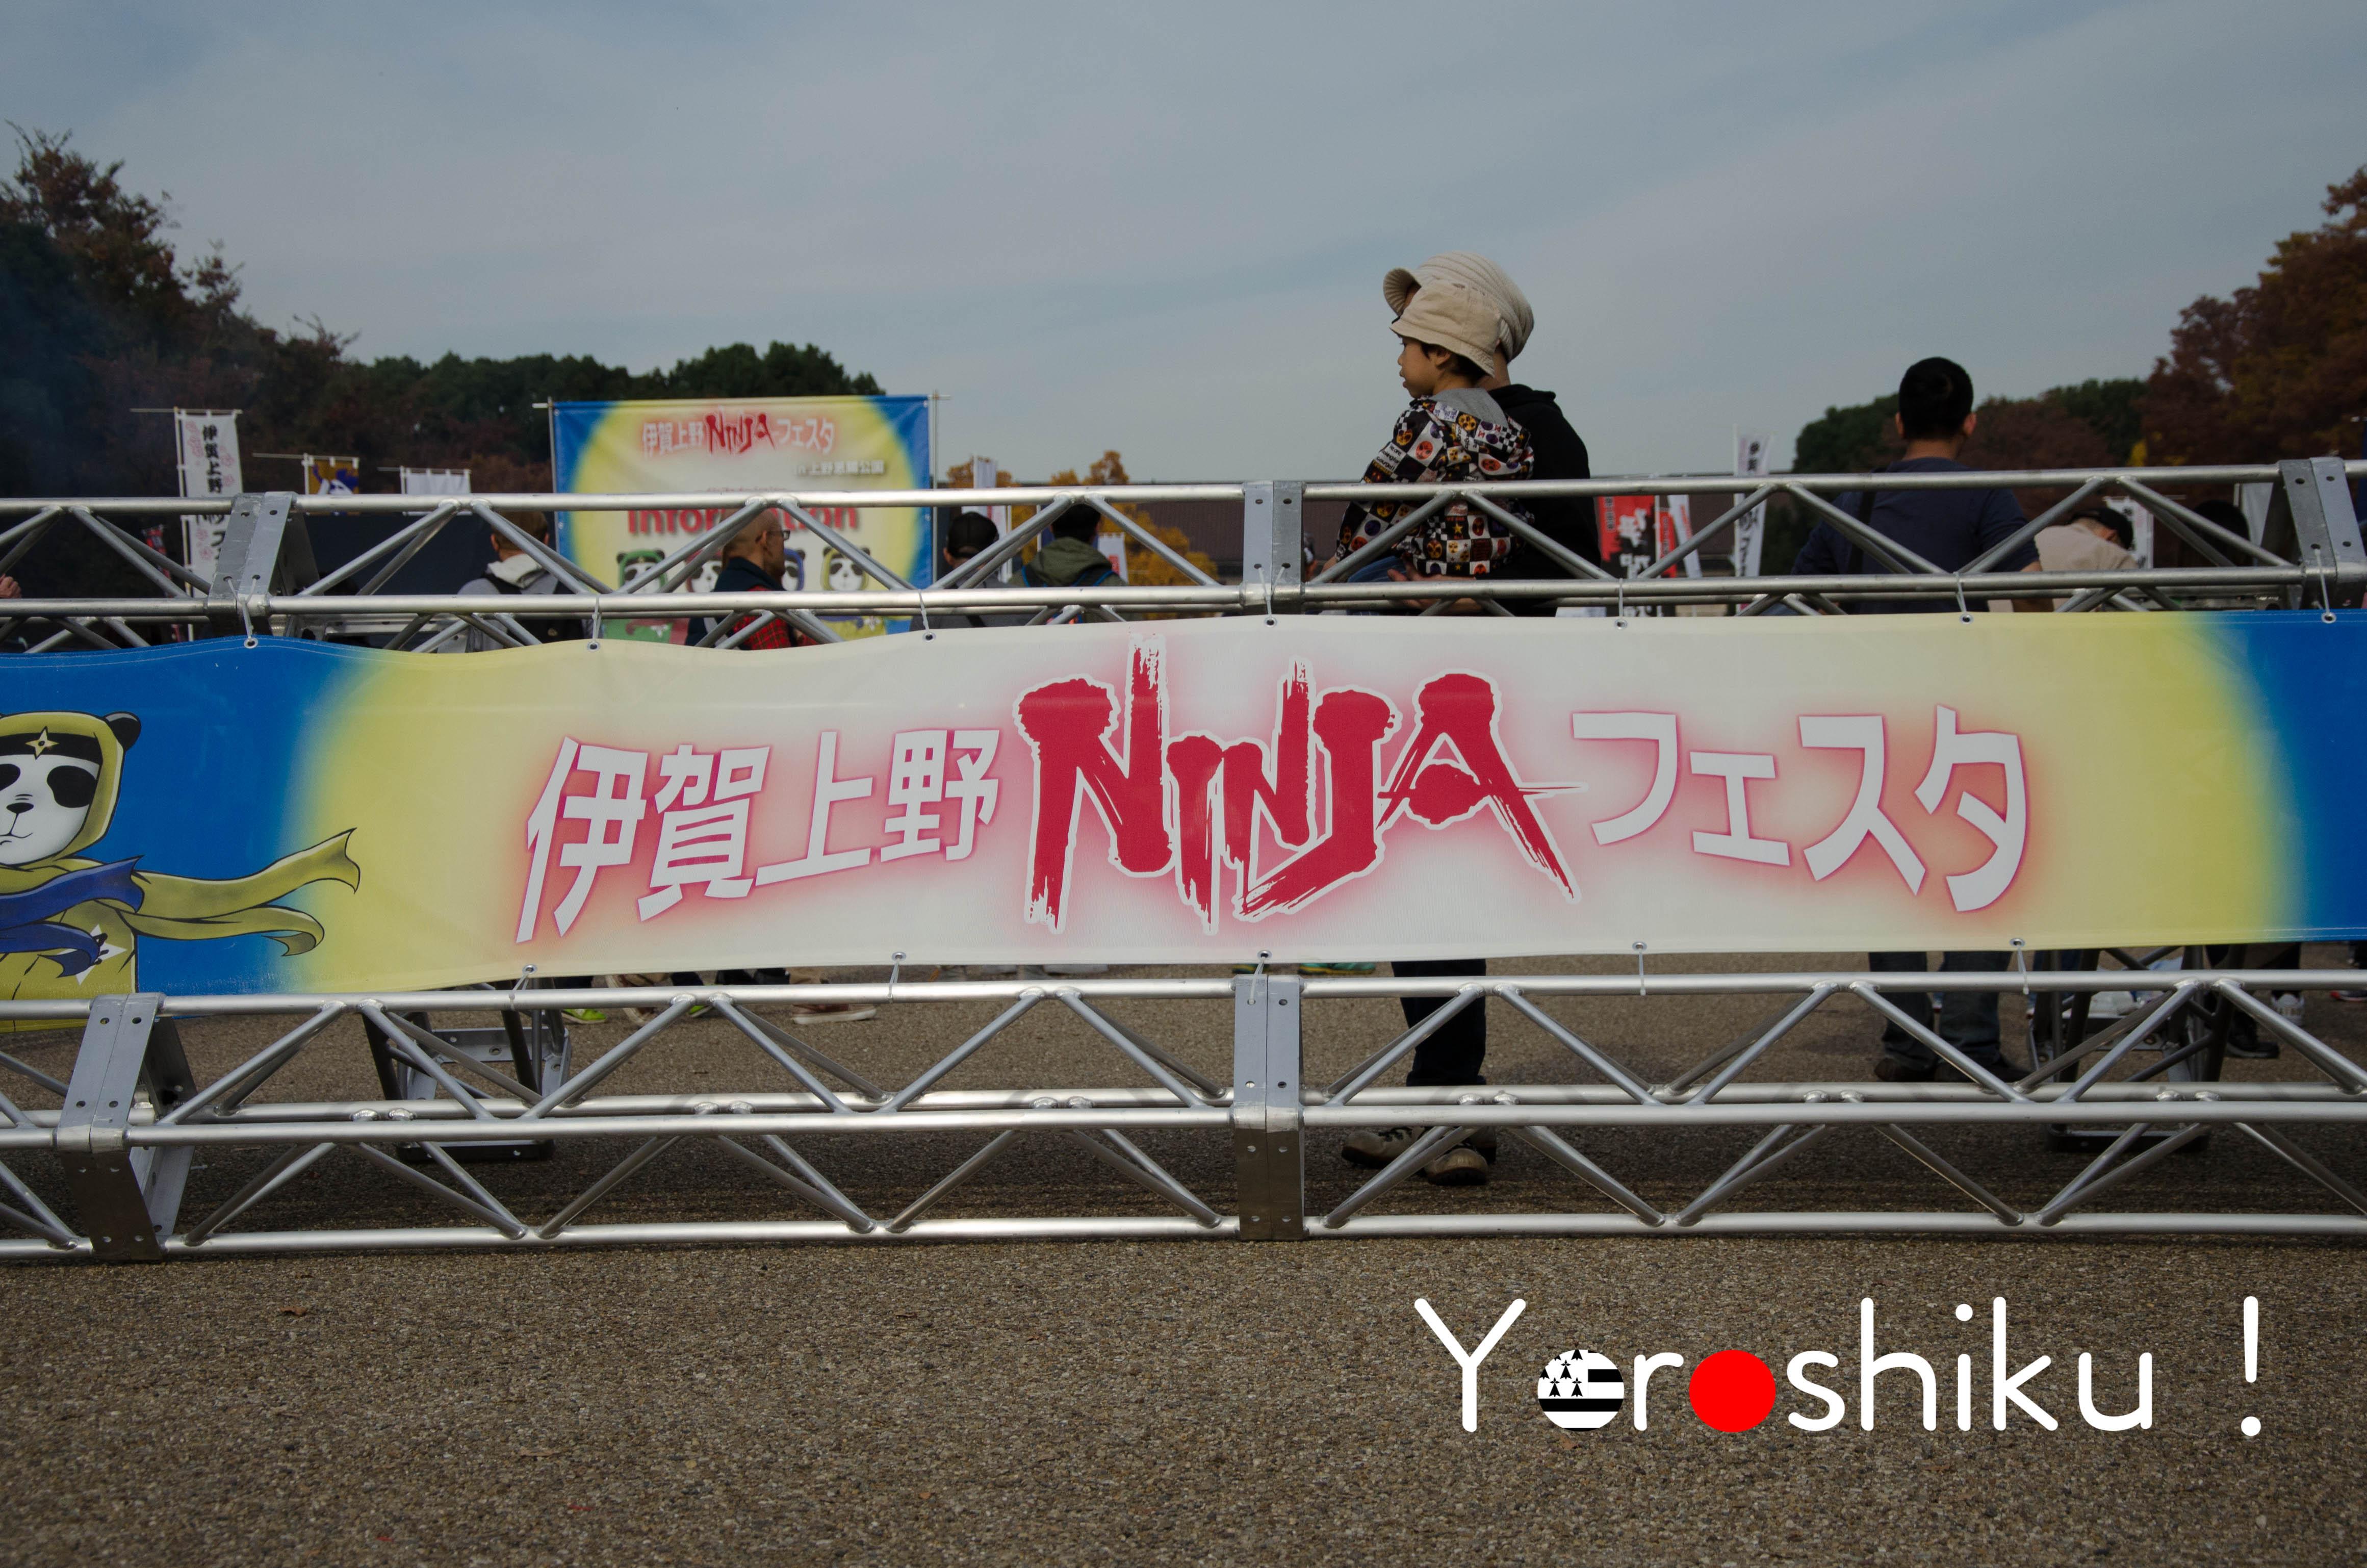 iga-ueno-ninja-festa-yoroshiku